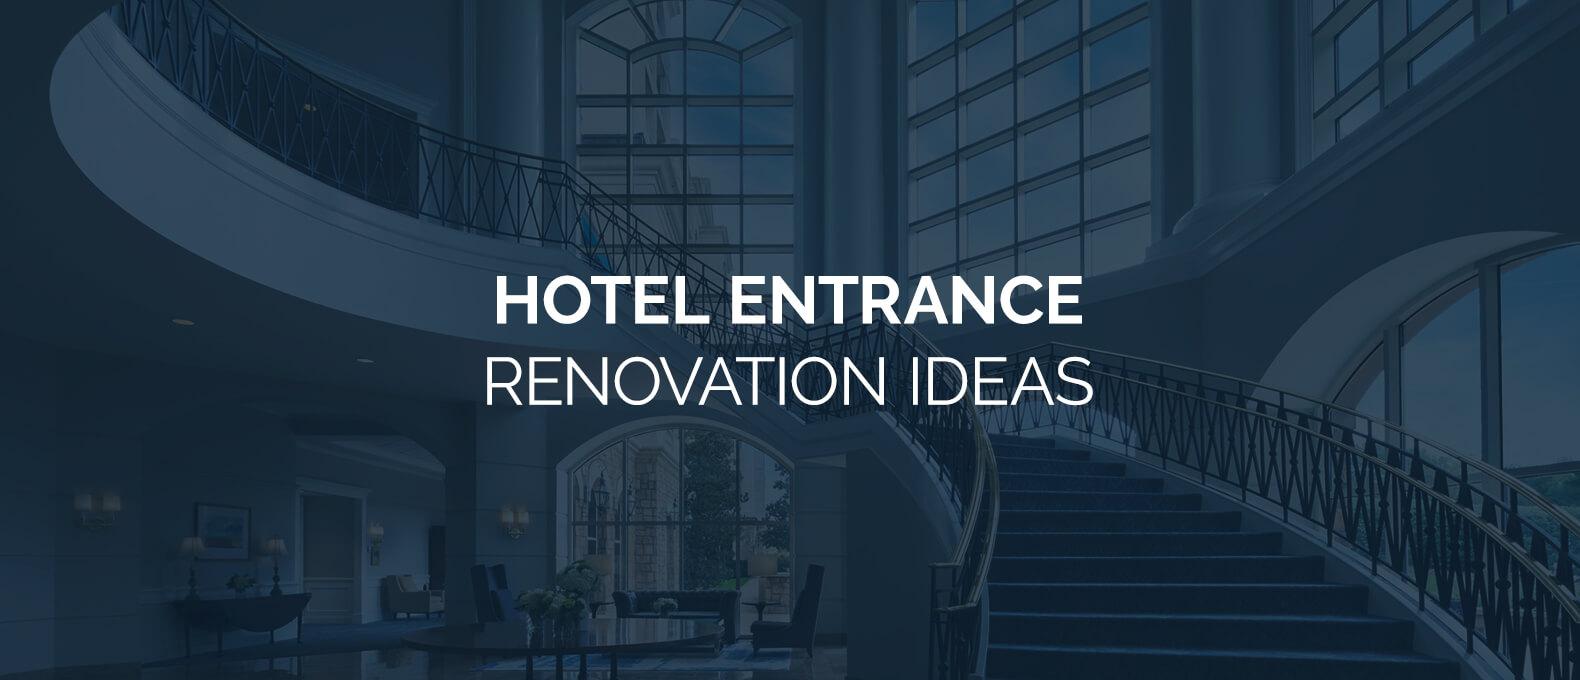 Hotel Entrance Renovation Ideas